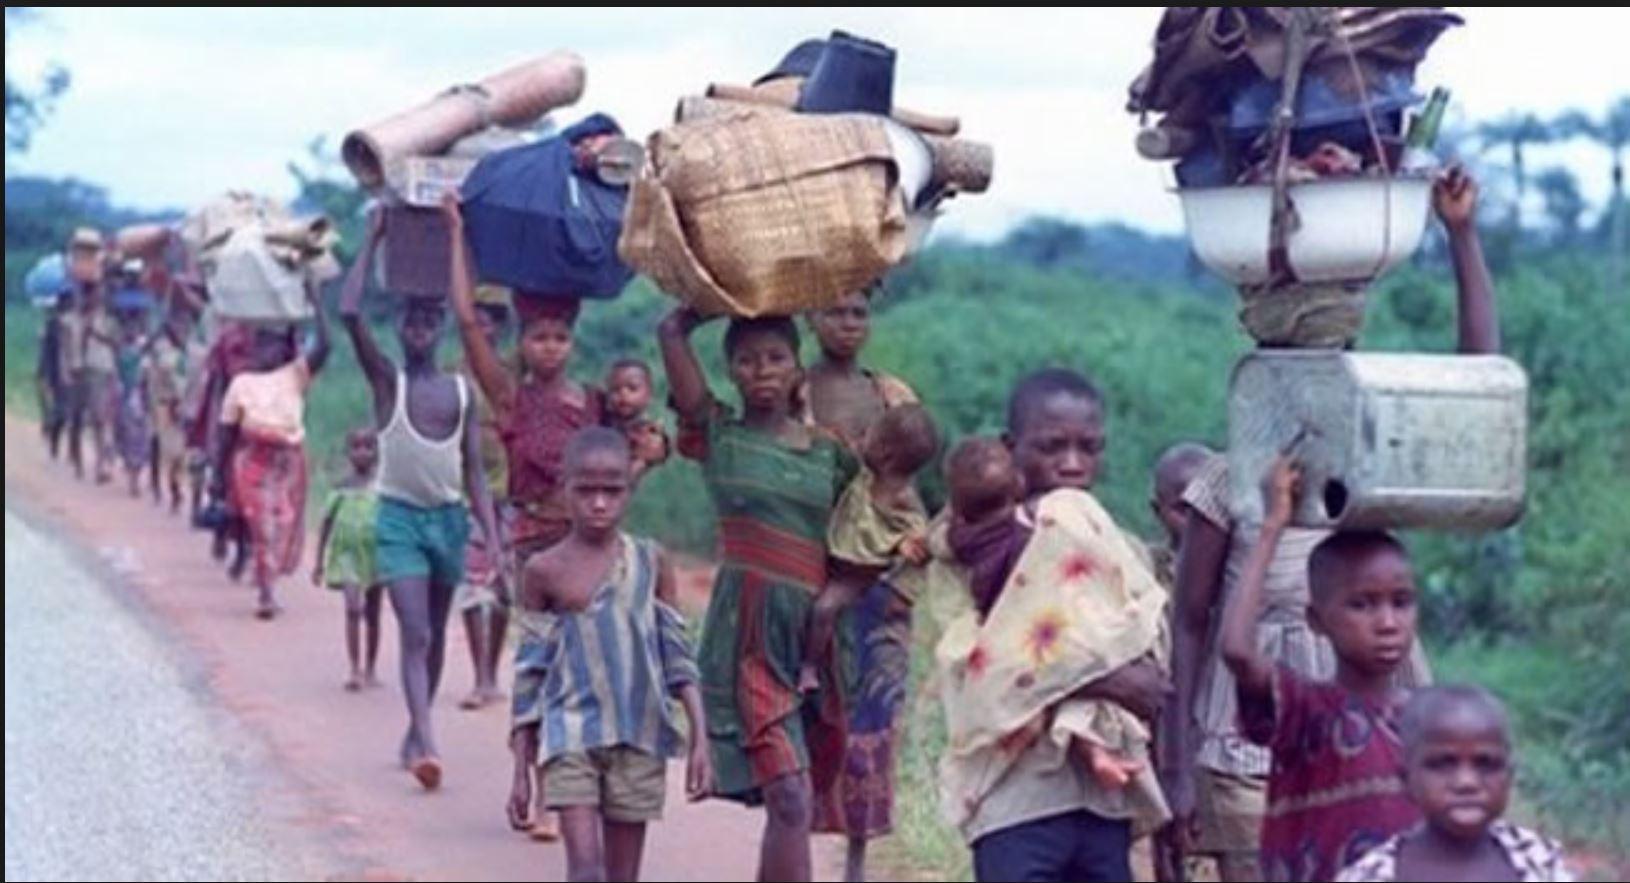 Niger Republic to return 130,000 Nigerian refugees in December